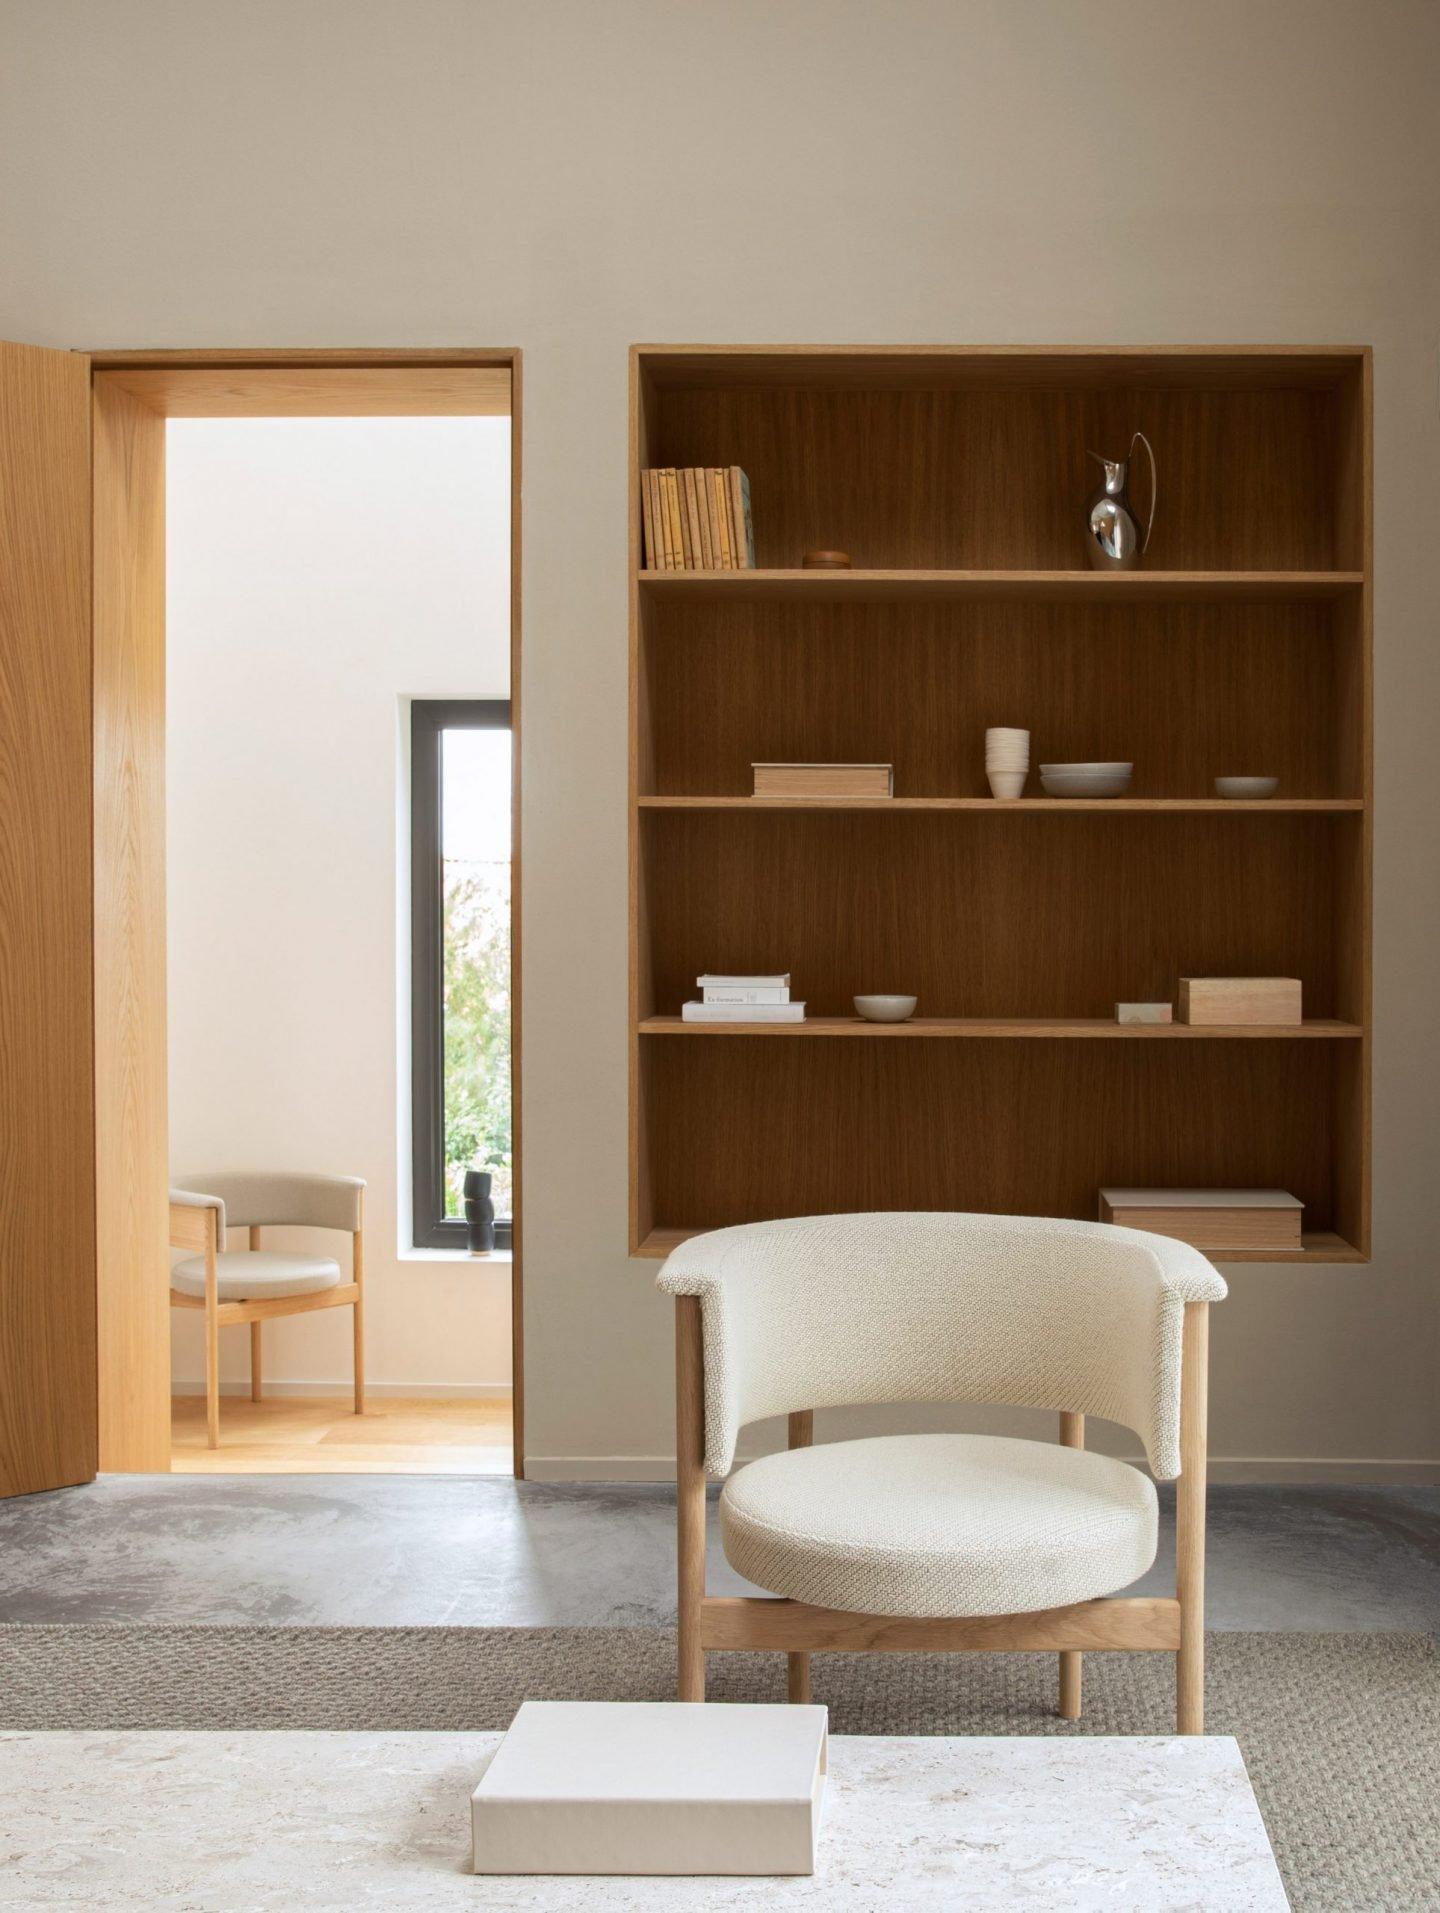 IGNANT-Architecture-Norm-Architects-Archipelago-House-011